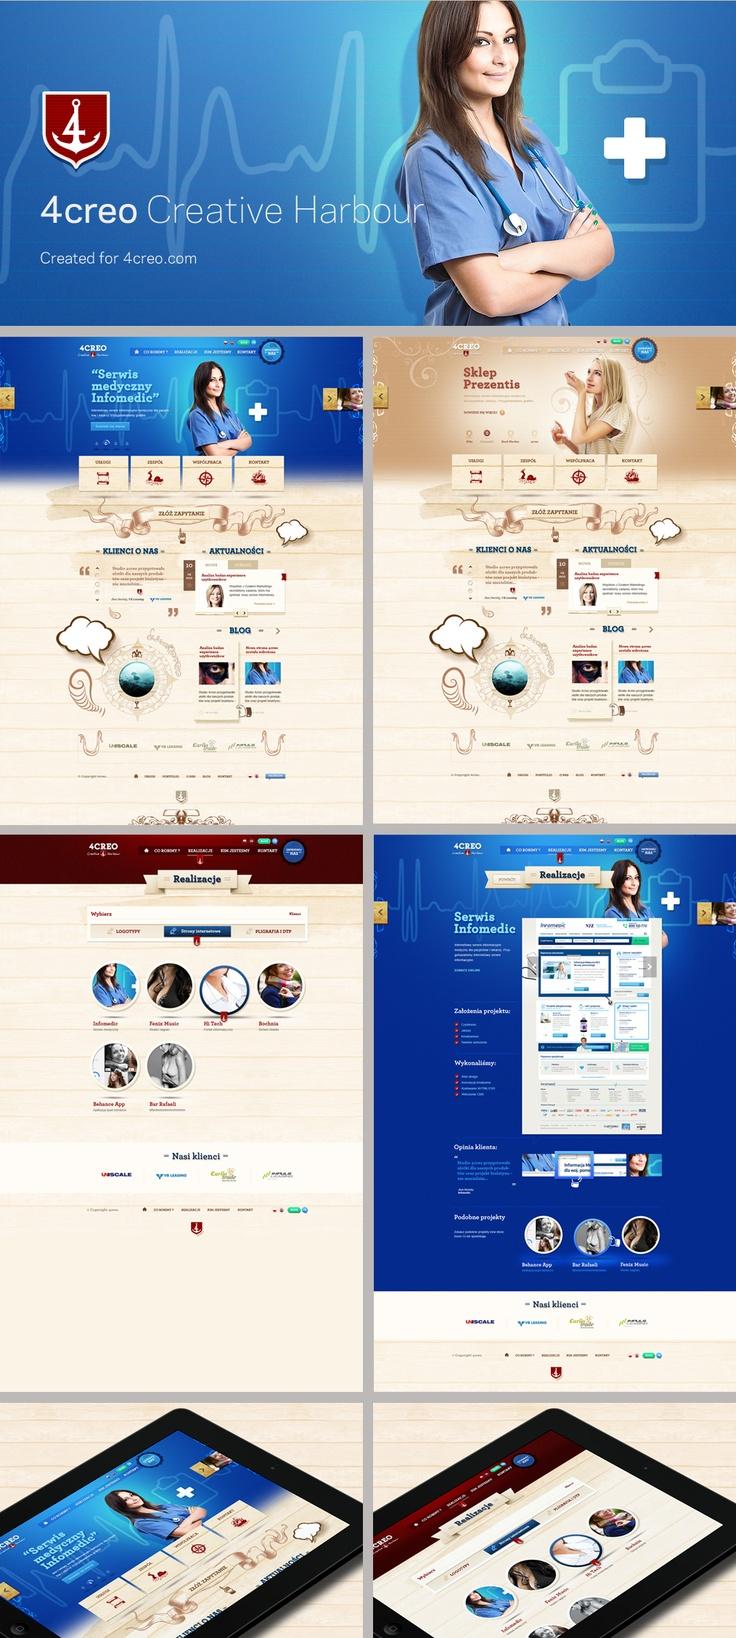 #webdesign #it #web #design #layout #userinterface #website #webdesign <<< repinned by an #advertising #agency from #Hamburg / #Germany - www.BlickeDeeler.de